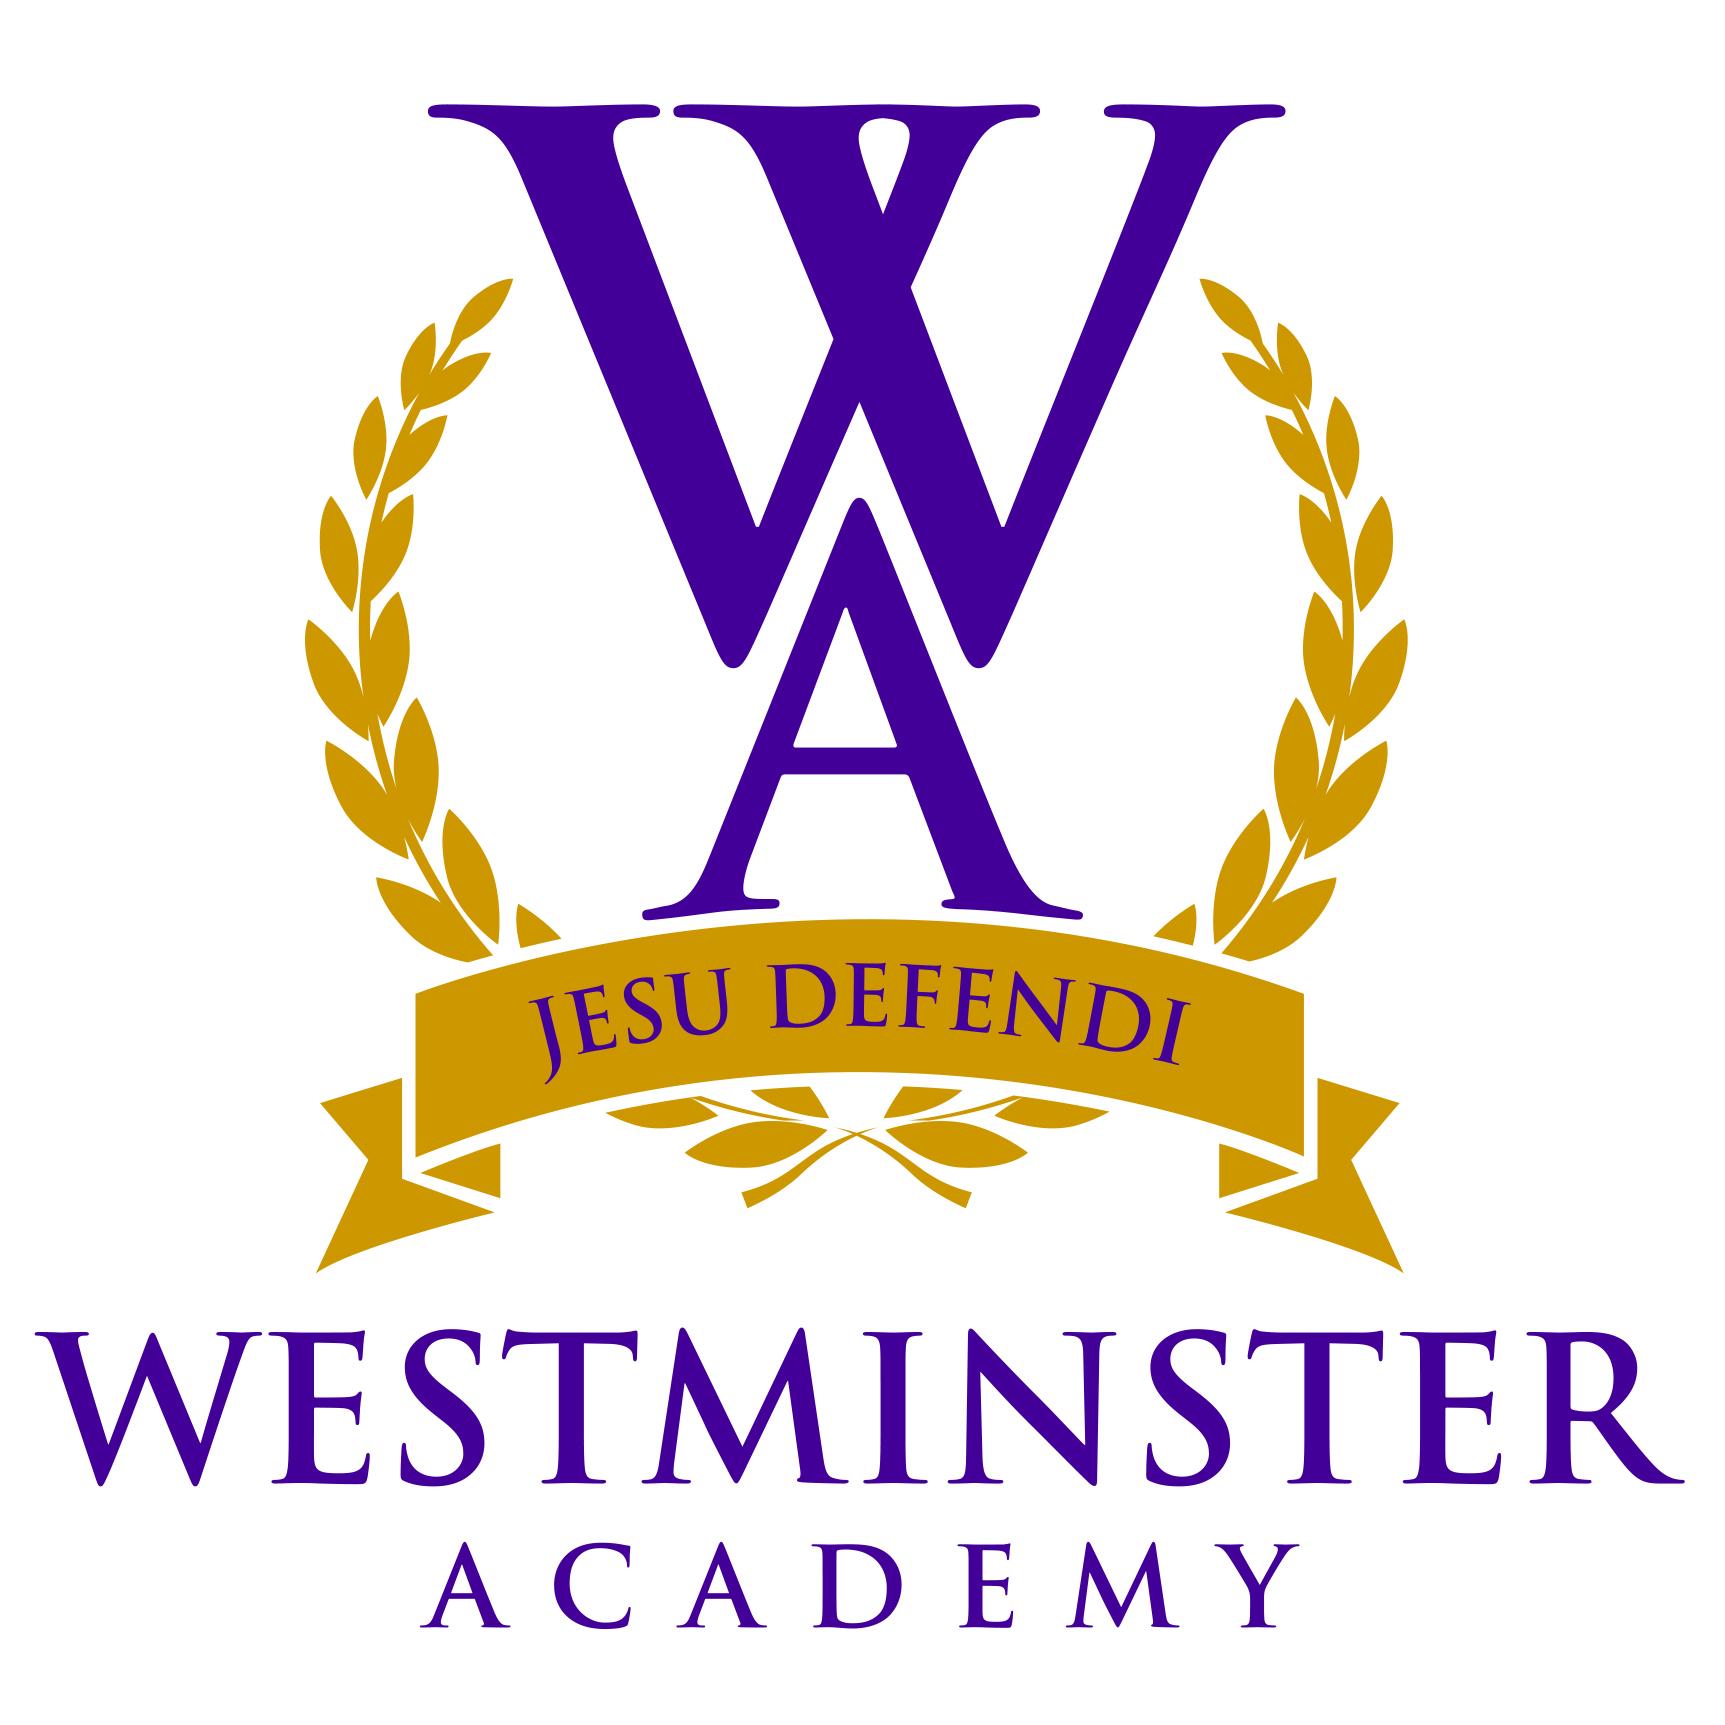 WestminsterAcademy_Logo_Process Color FINAL.eps